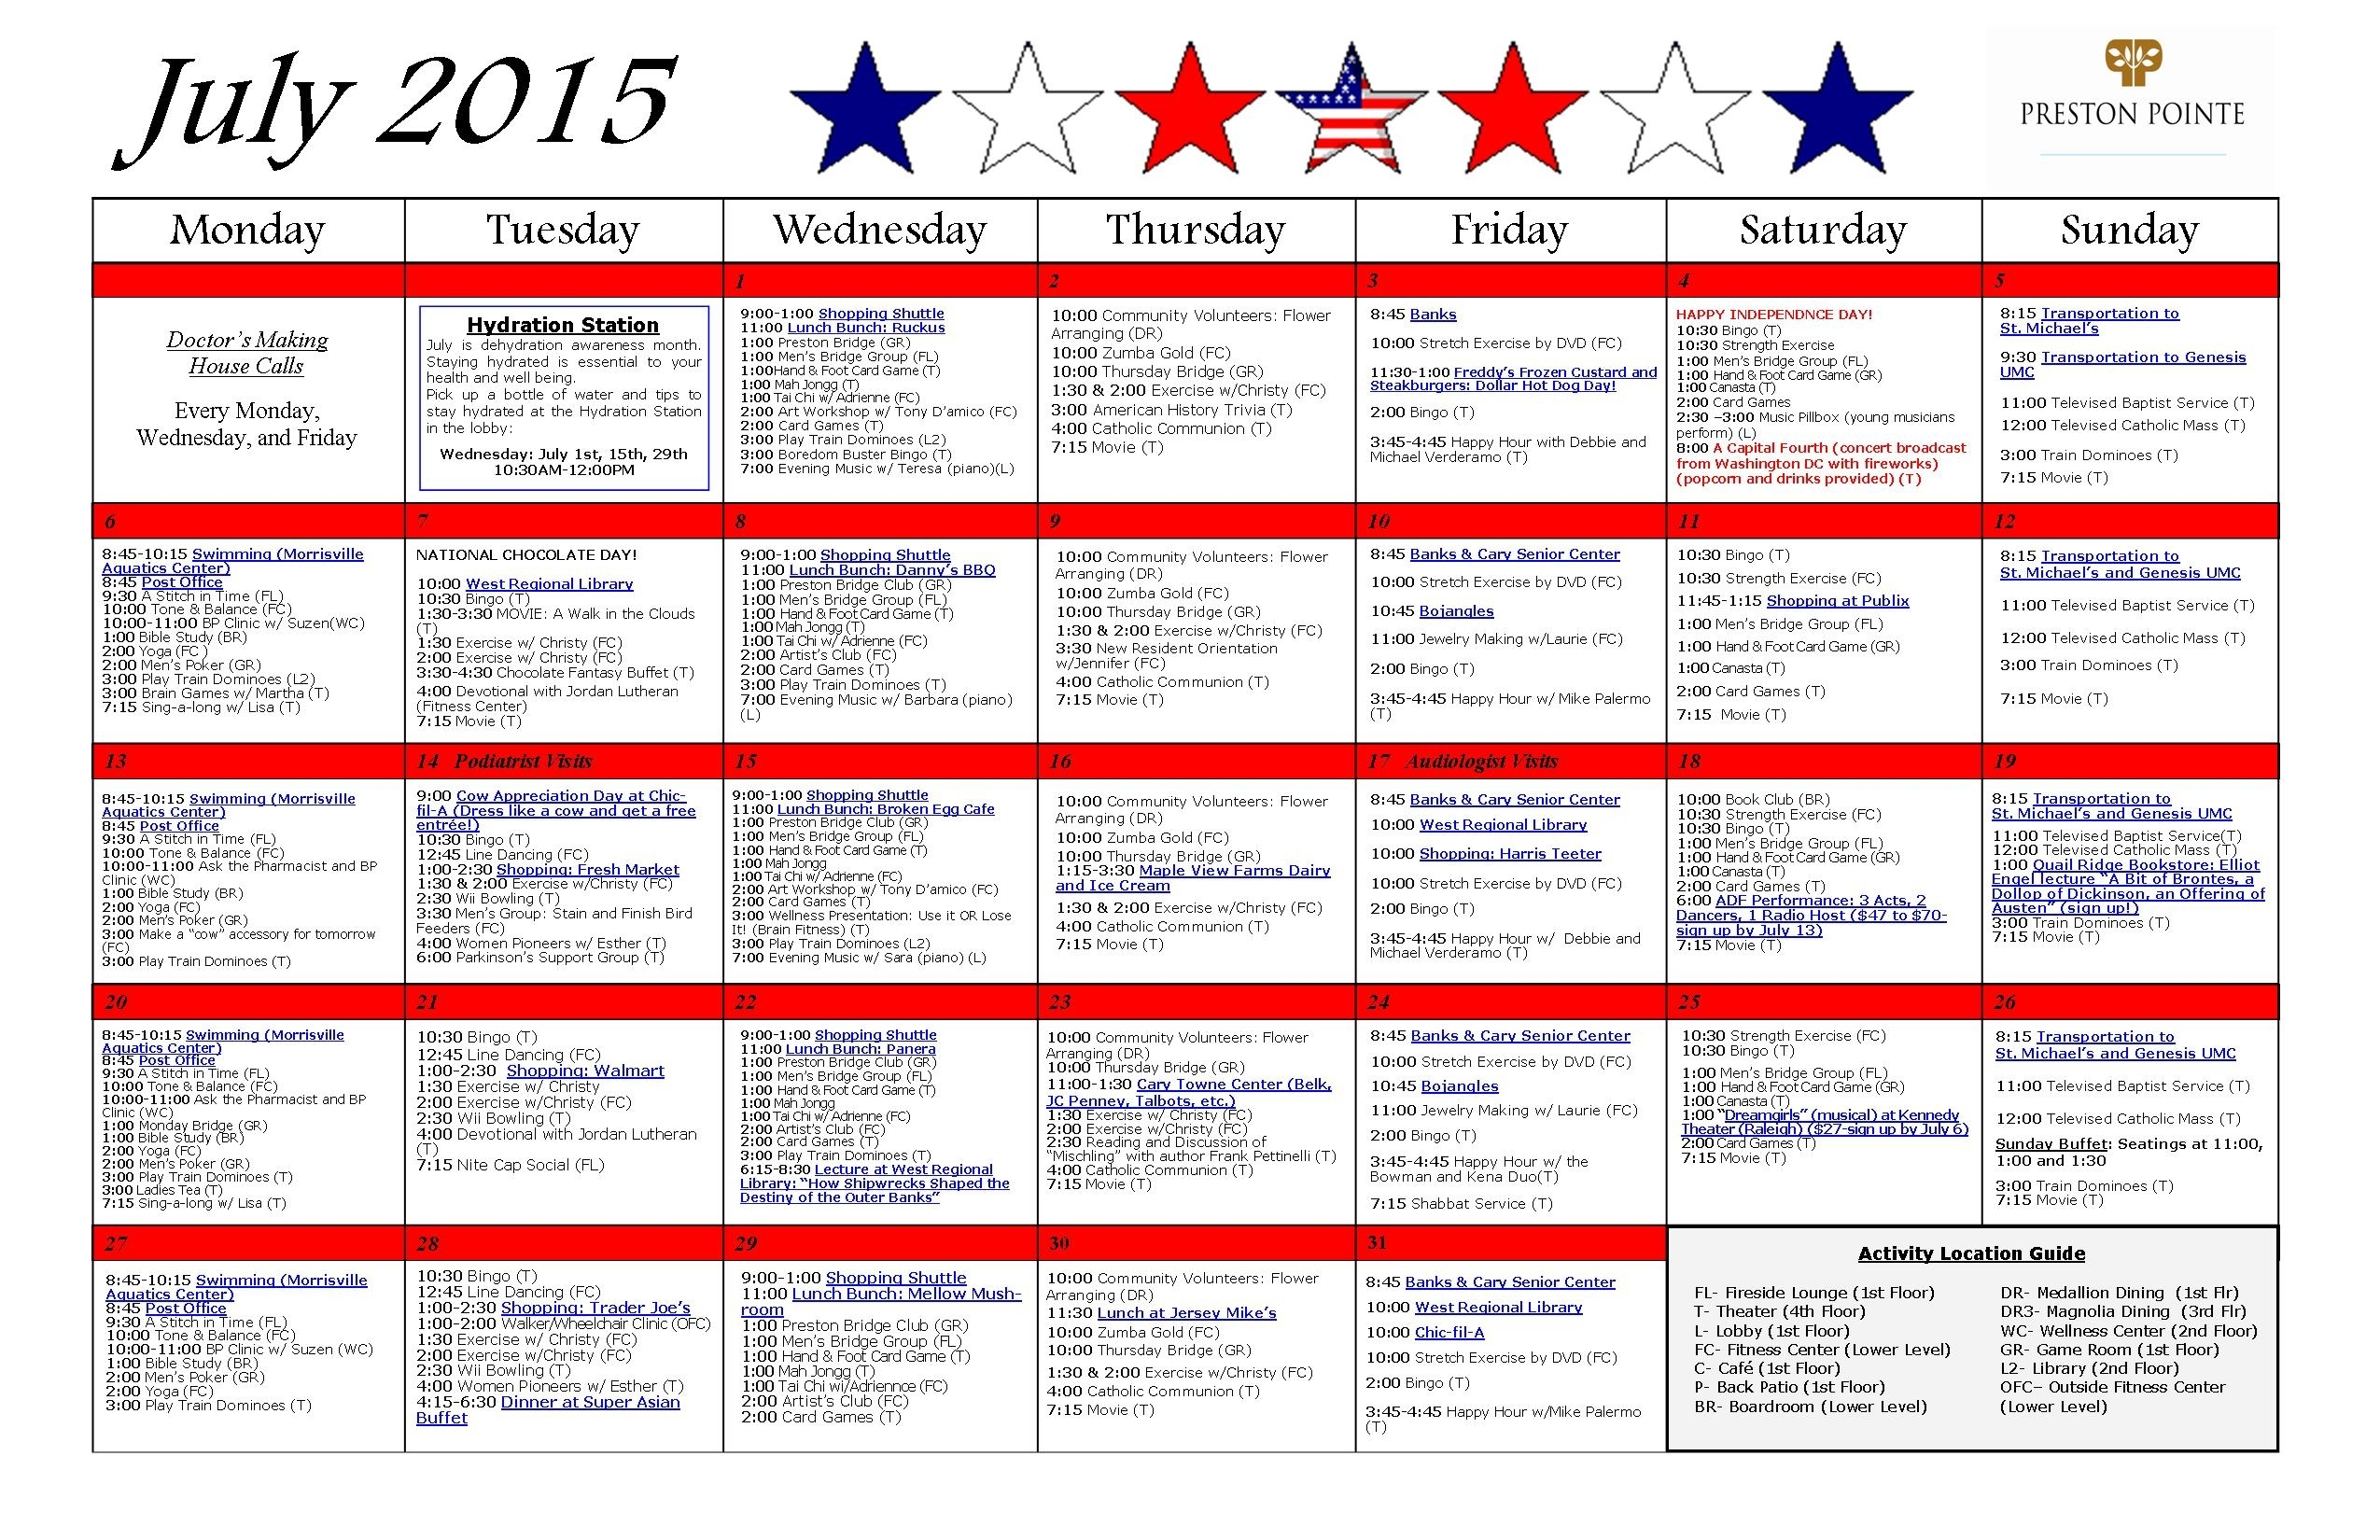 July 2015 Activity Calendar - Preston Pointe Retirement Community